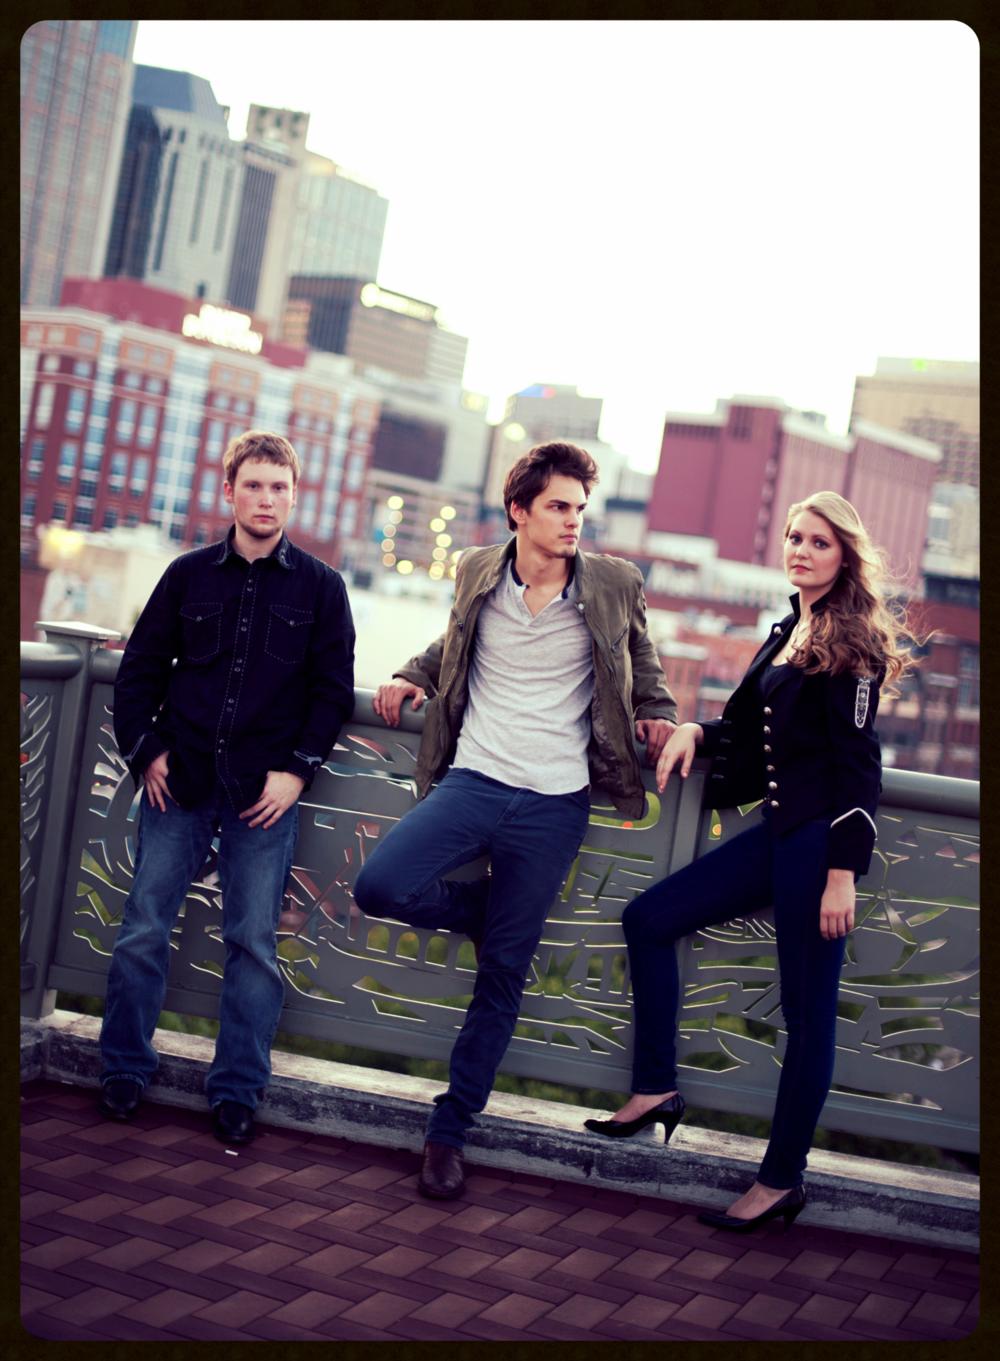 Kyle with Zach Ummer & Kayleigh Moyer, 2012